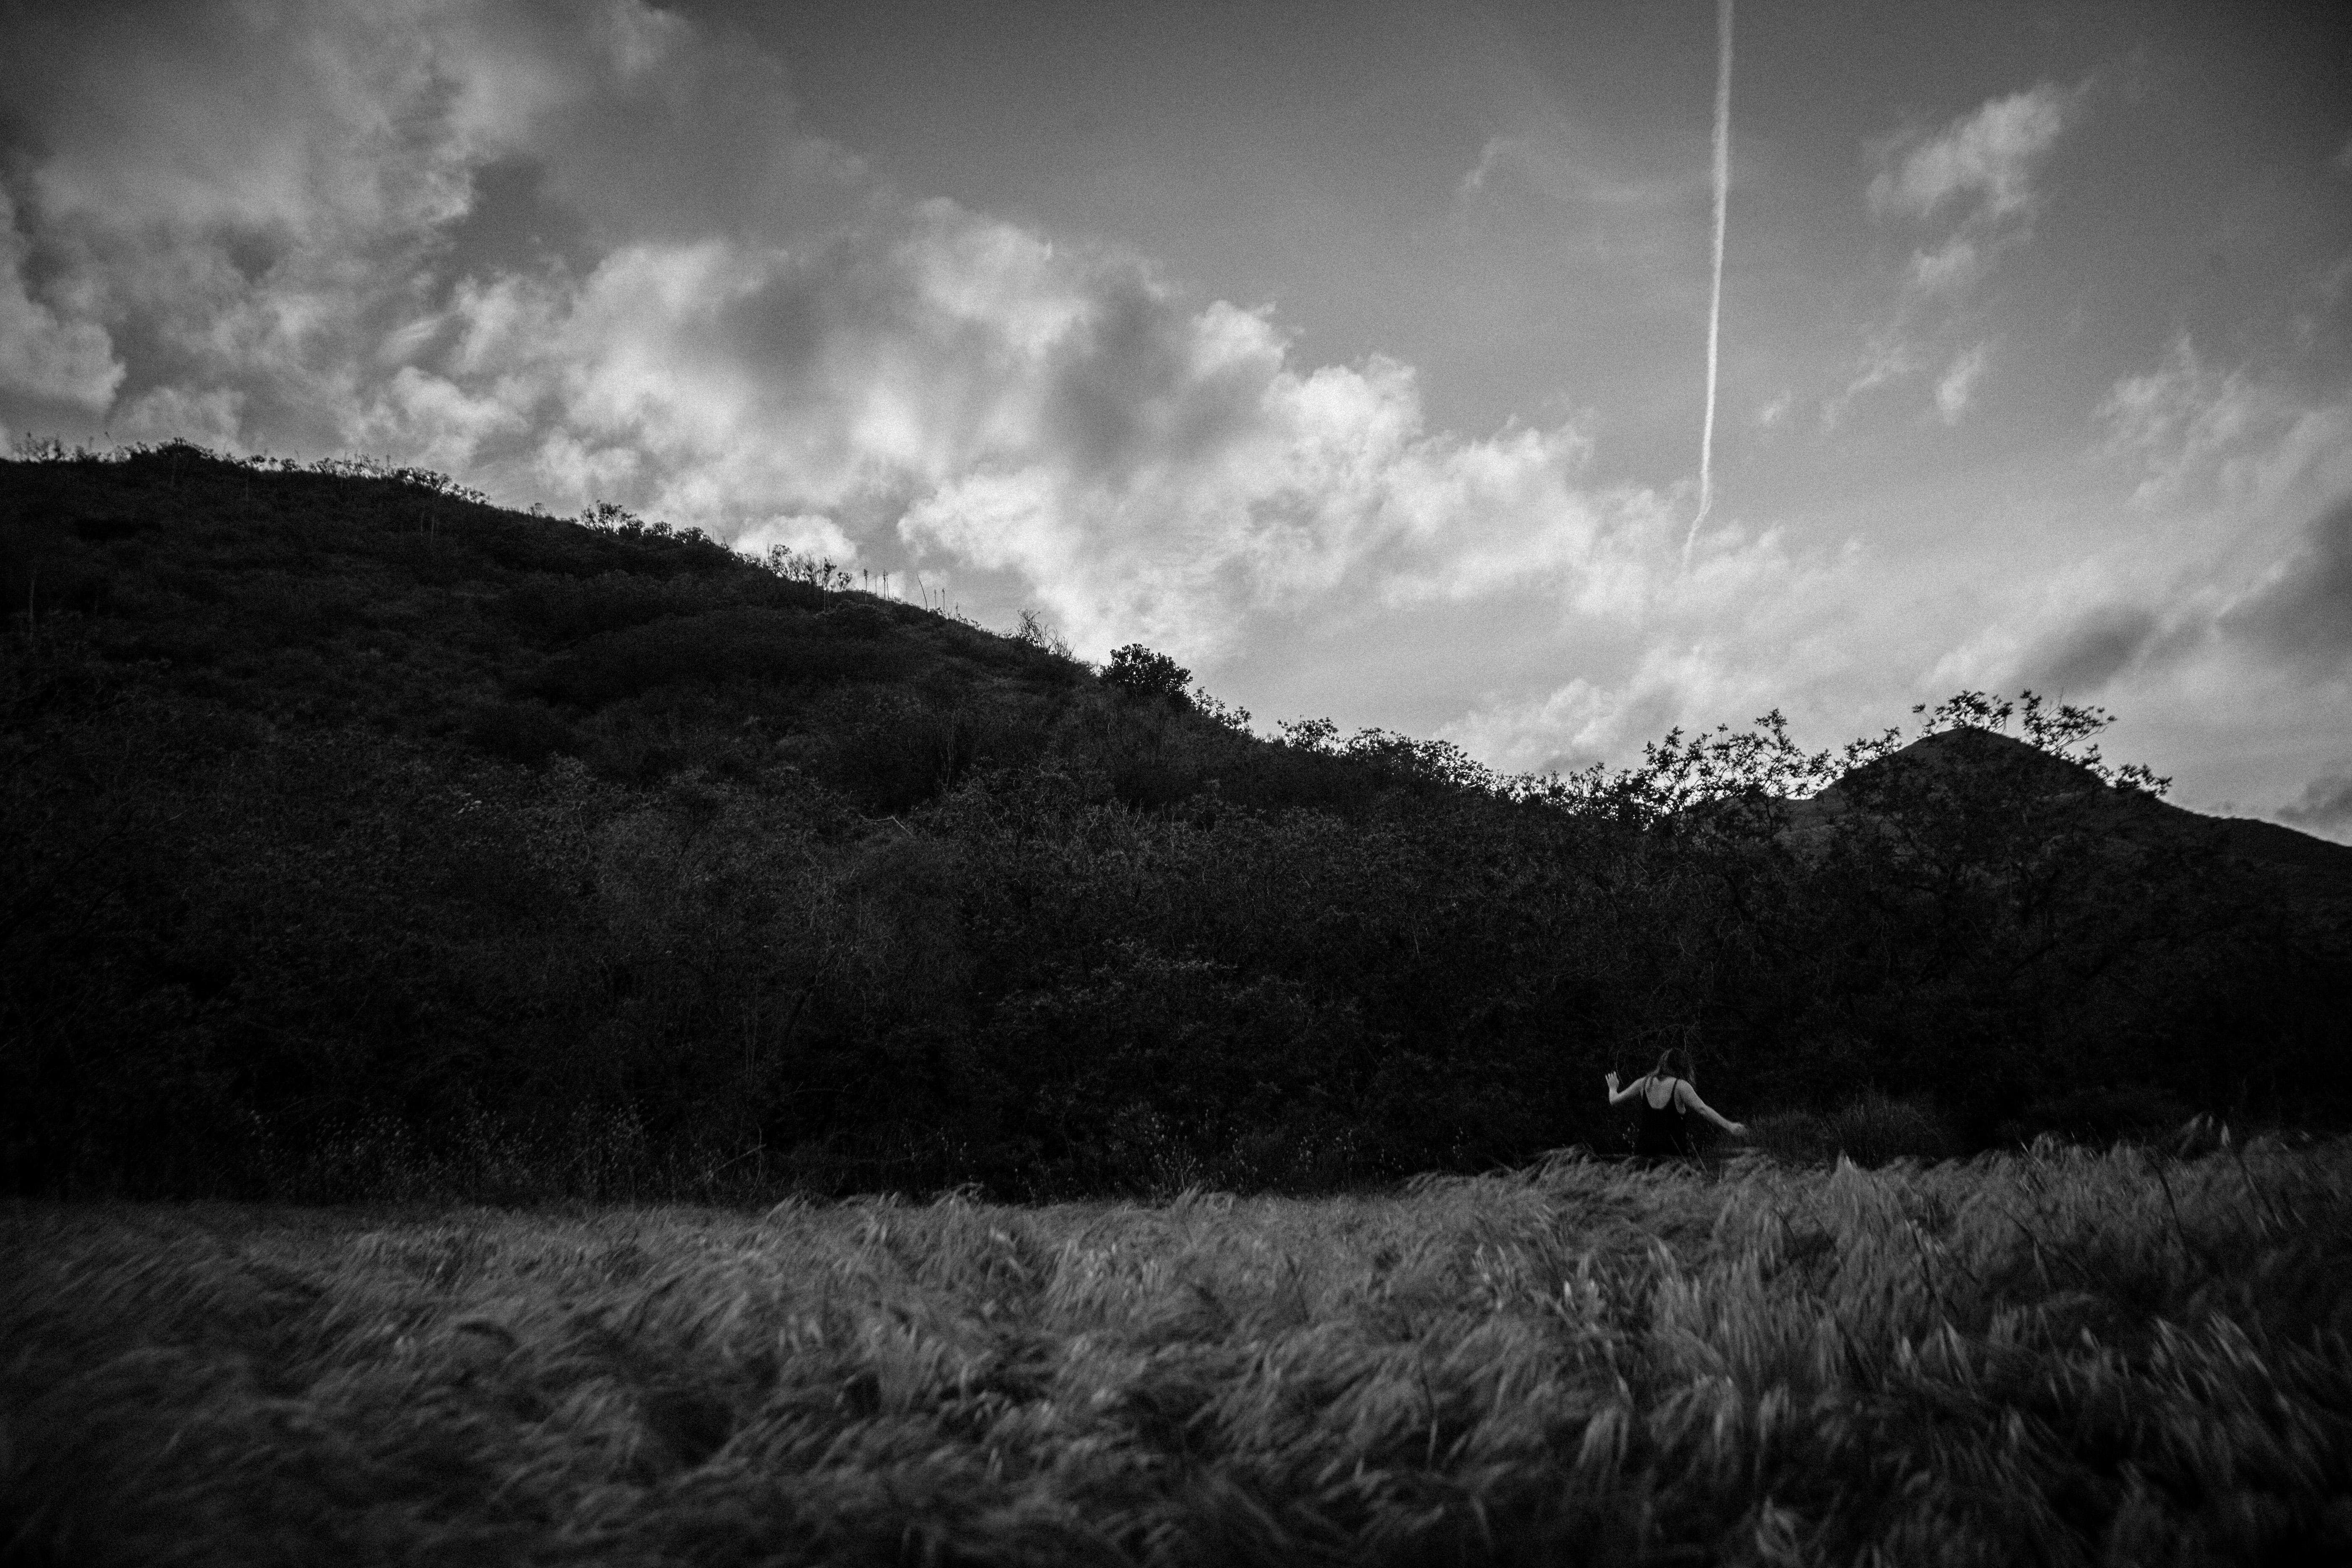 © 2015 Jen Rosenstein Photography